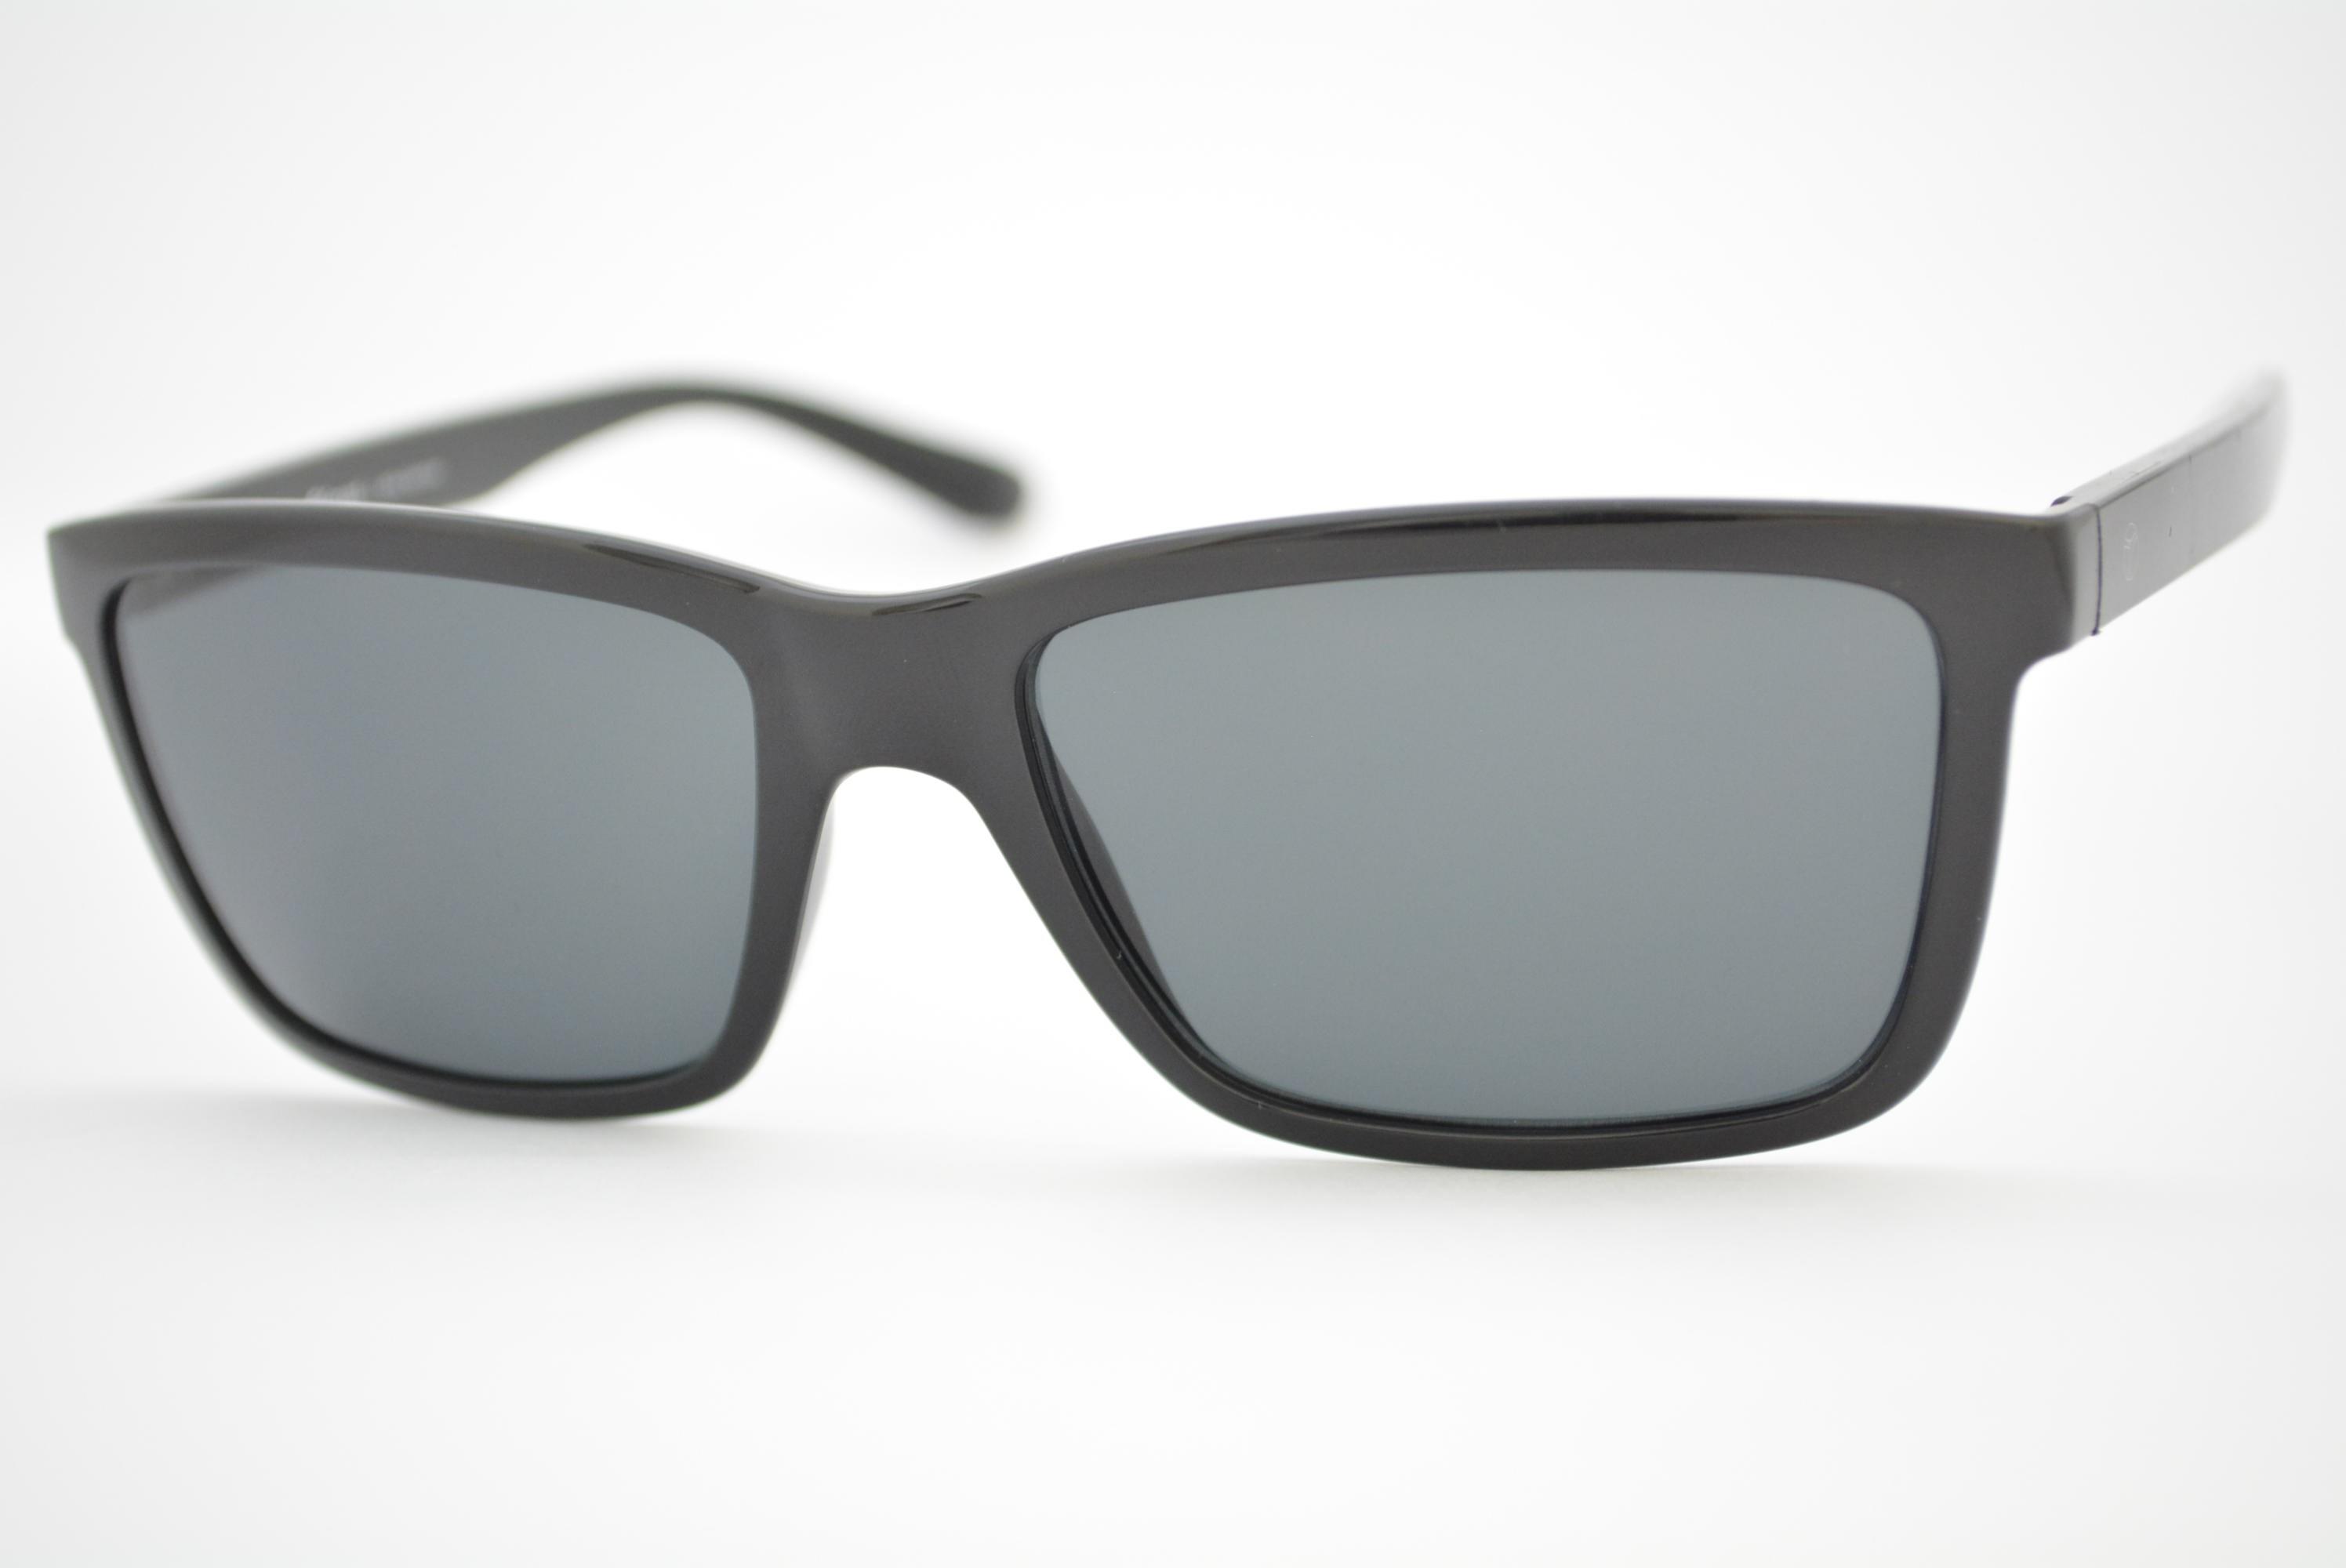 óculos de sol Tecnol mod tn4010 d577 Ótica Cardoso 99a2b7cce0